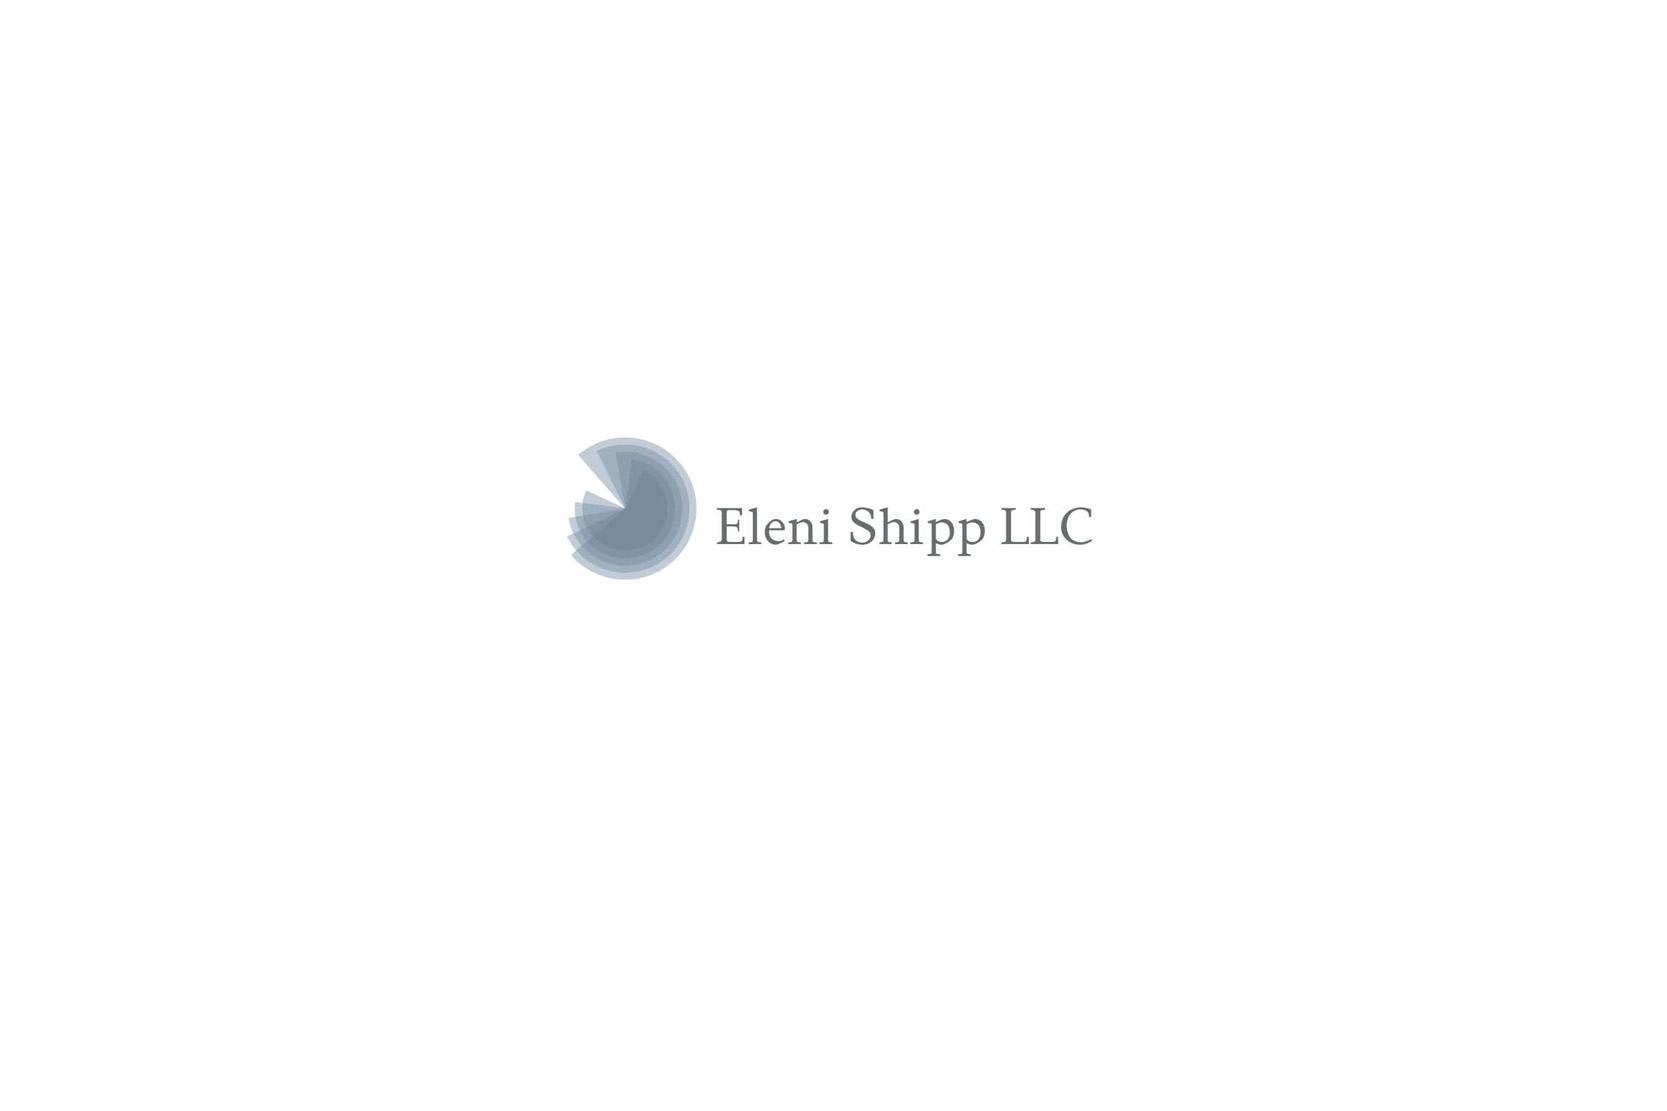 Eleni Shipp_Branding Identity0